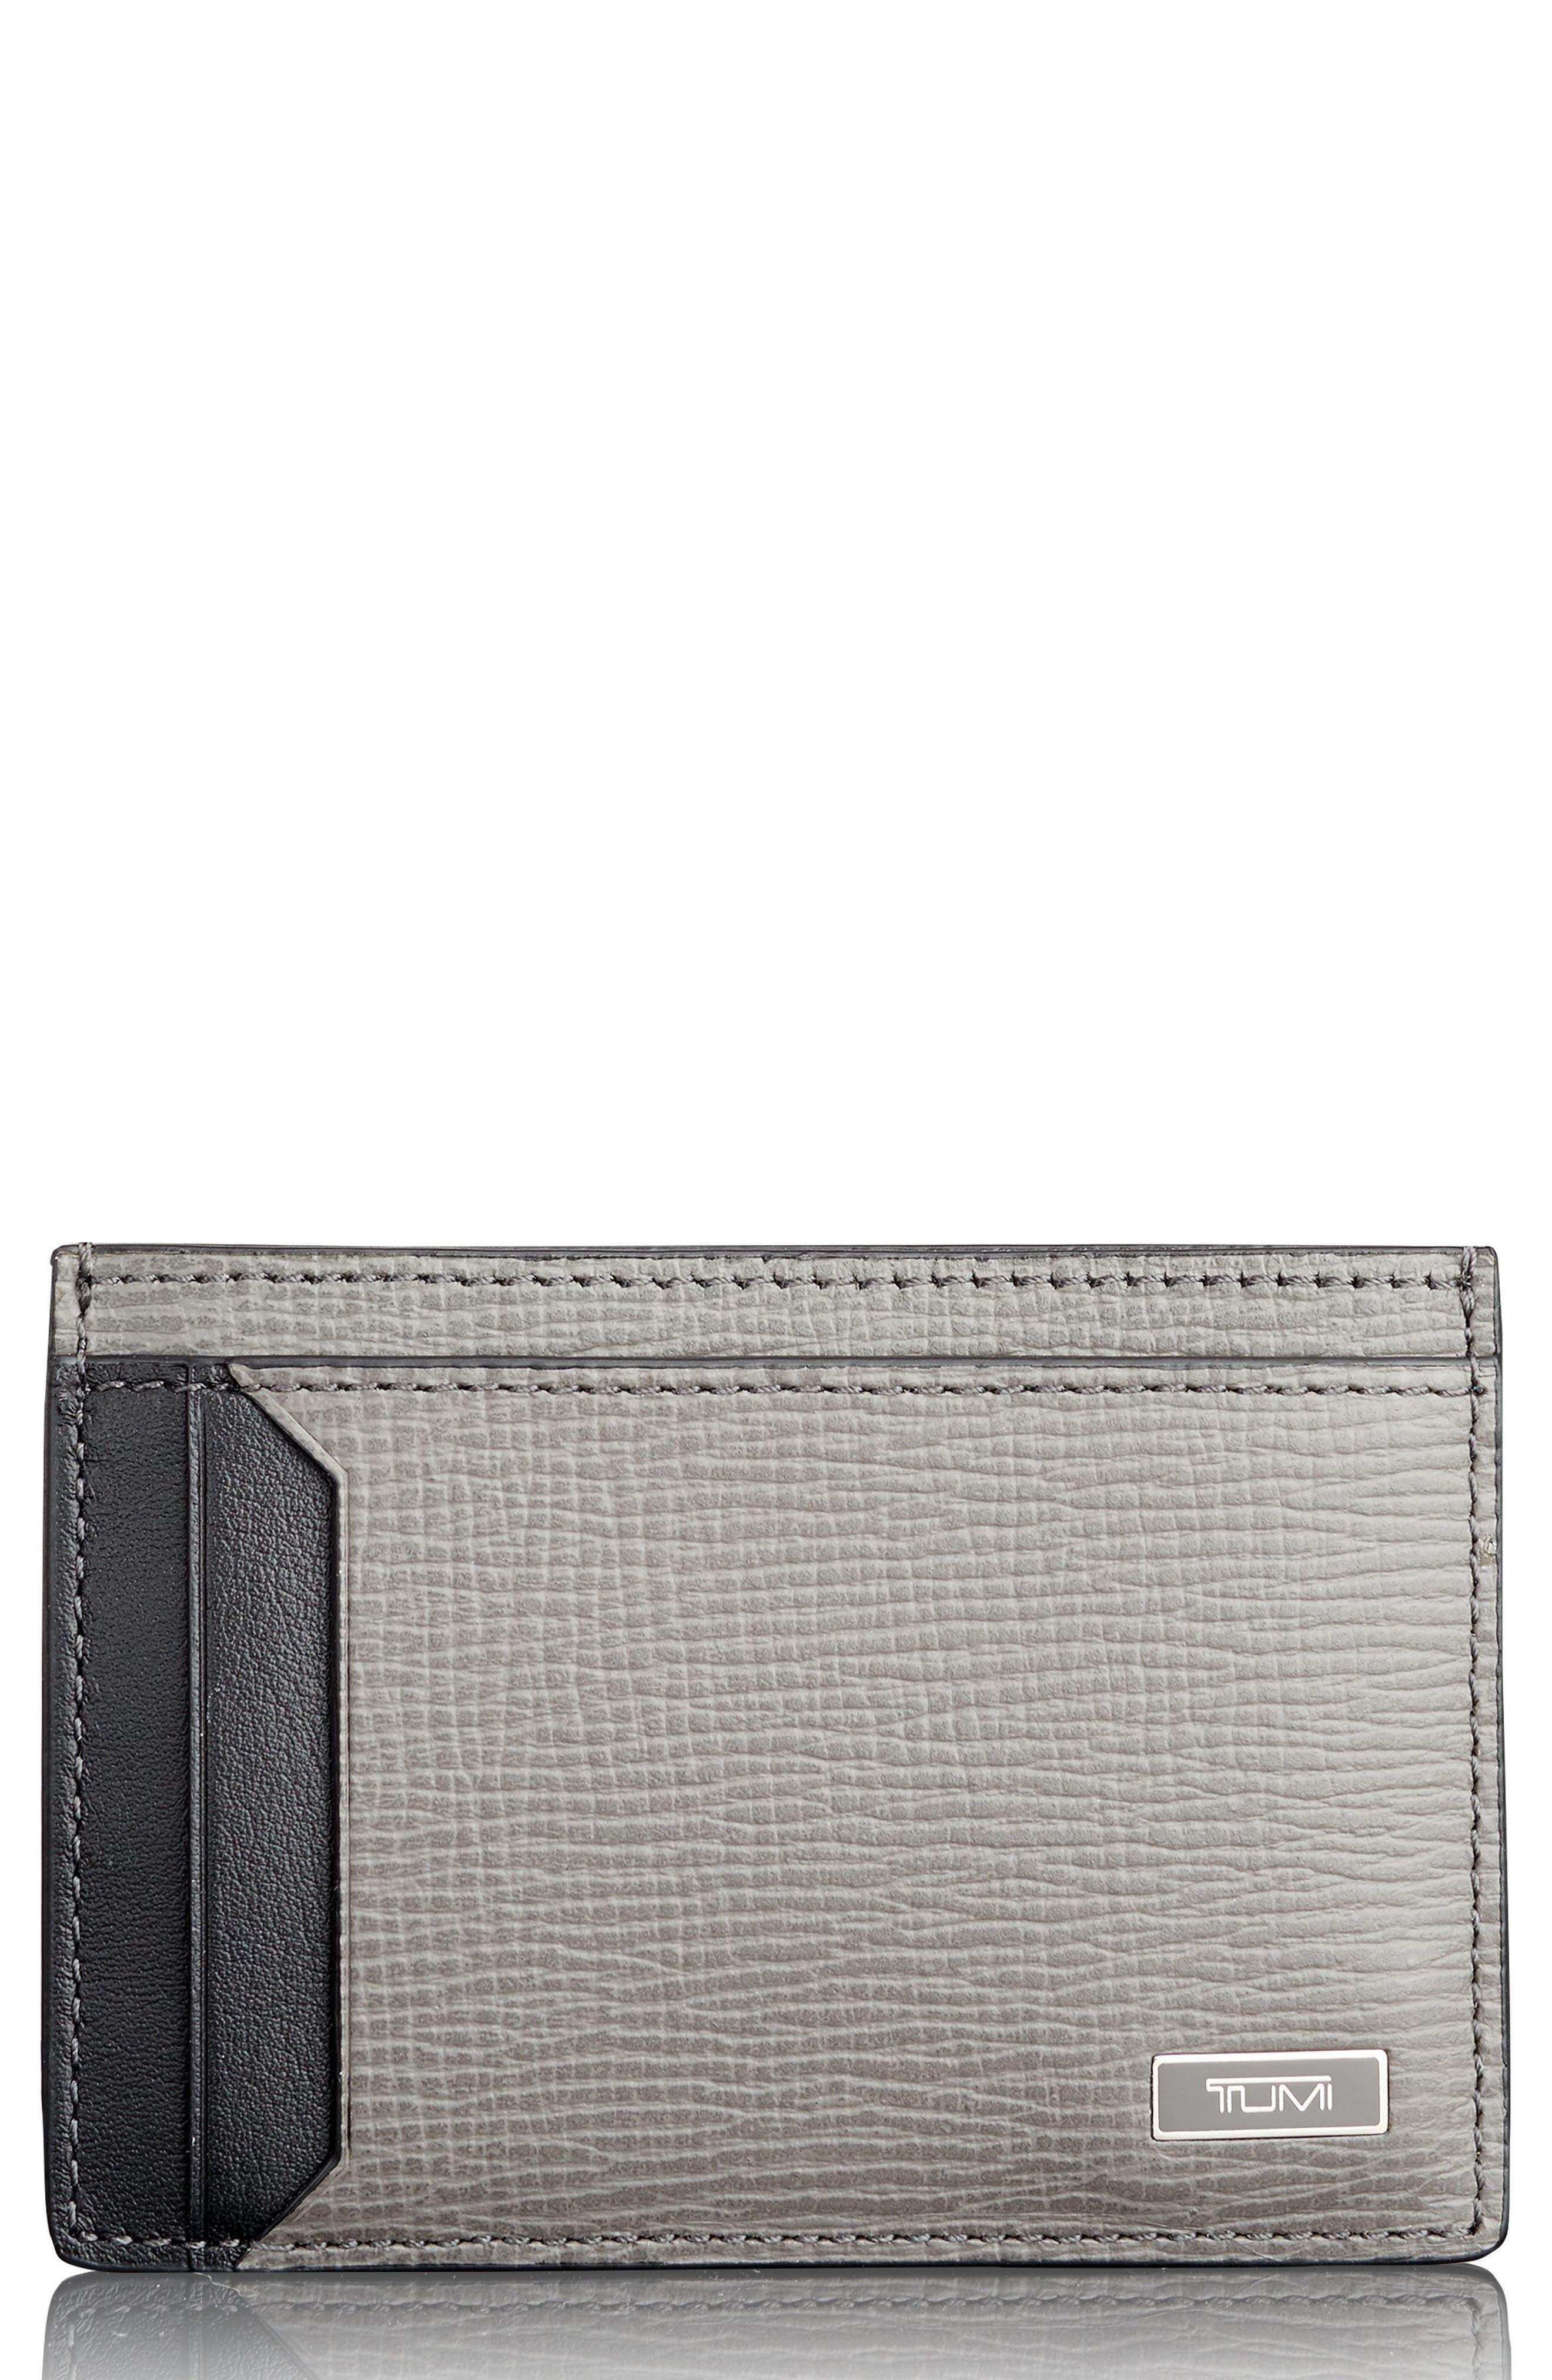 Monaco Leather RFID Money Clip Card Case,                         Main,                         color, 020